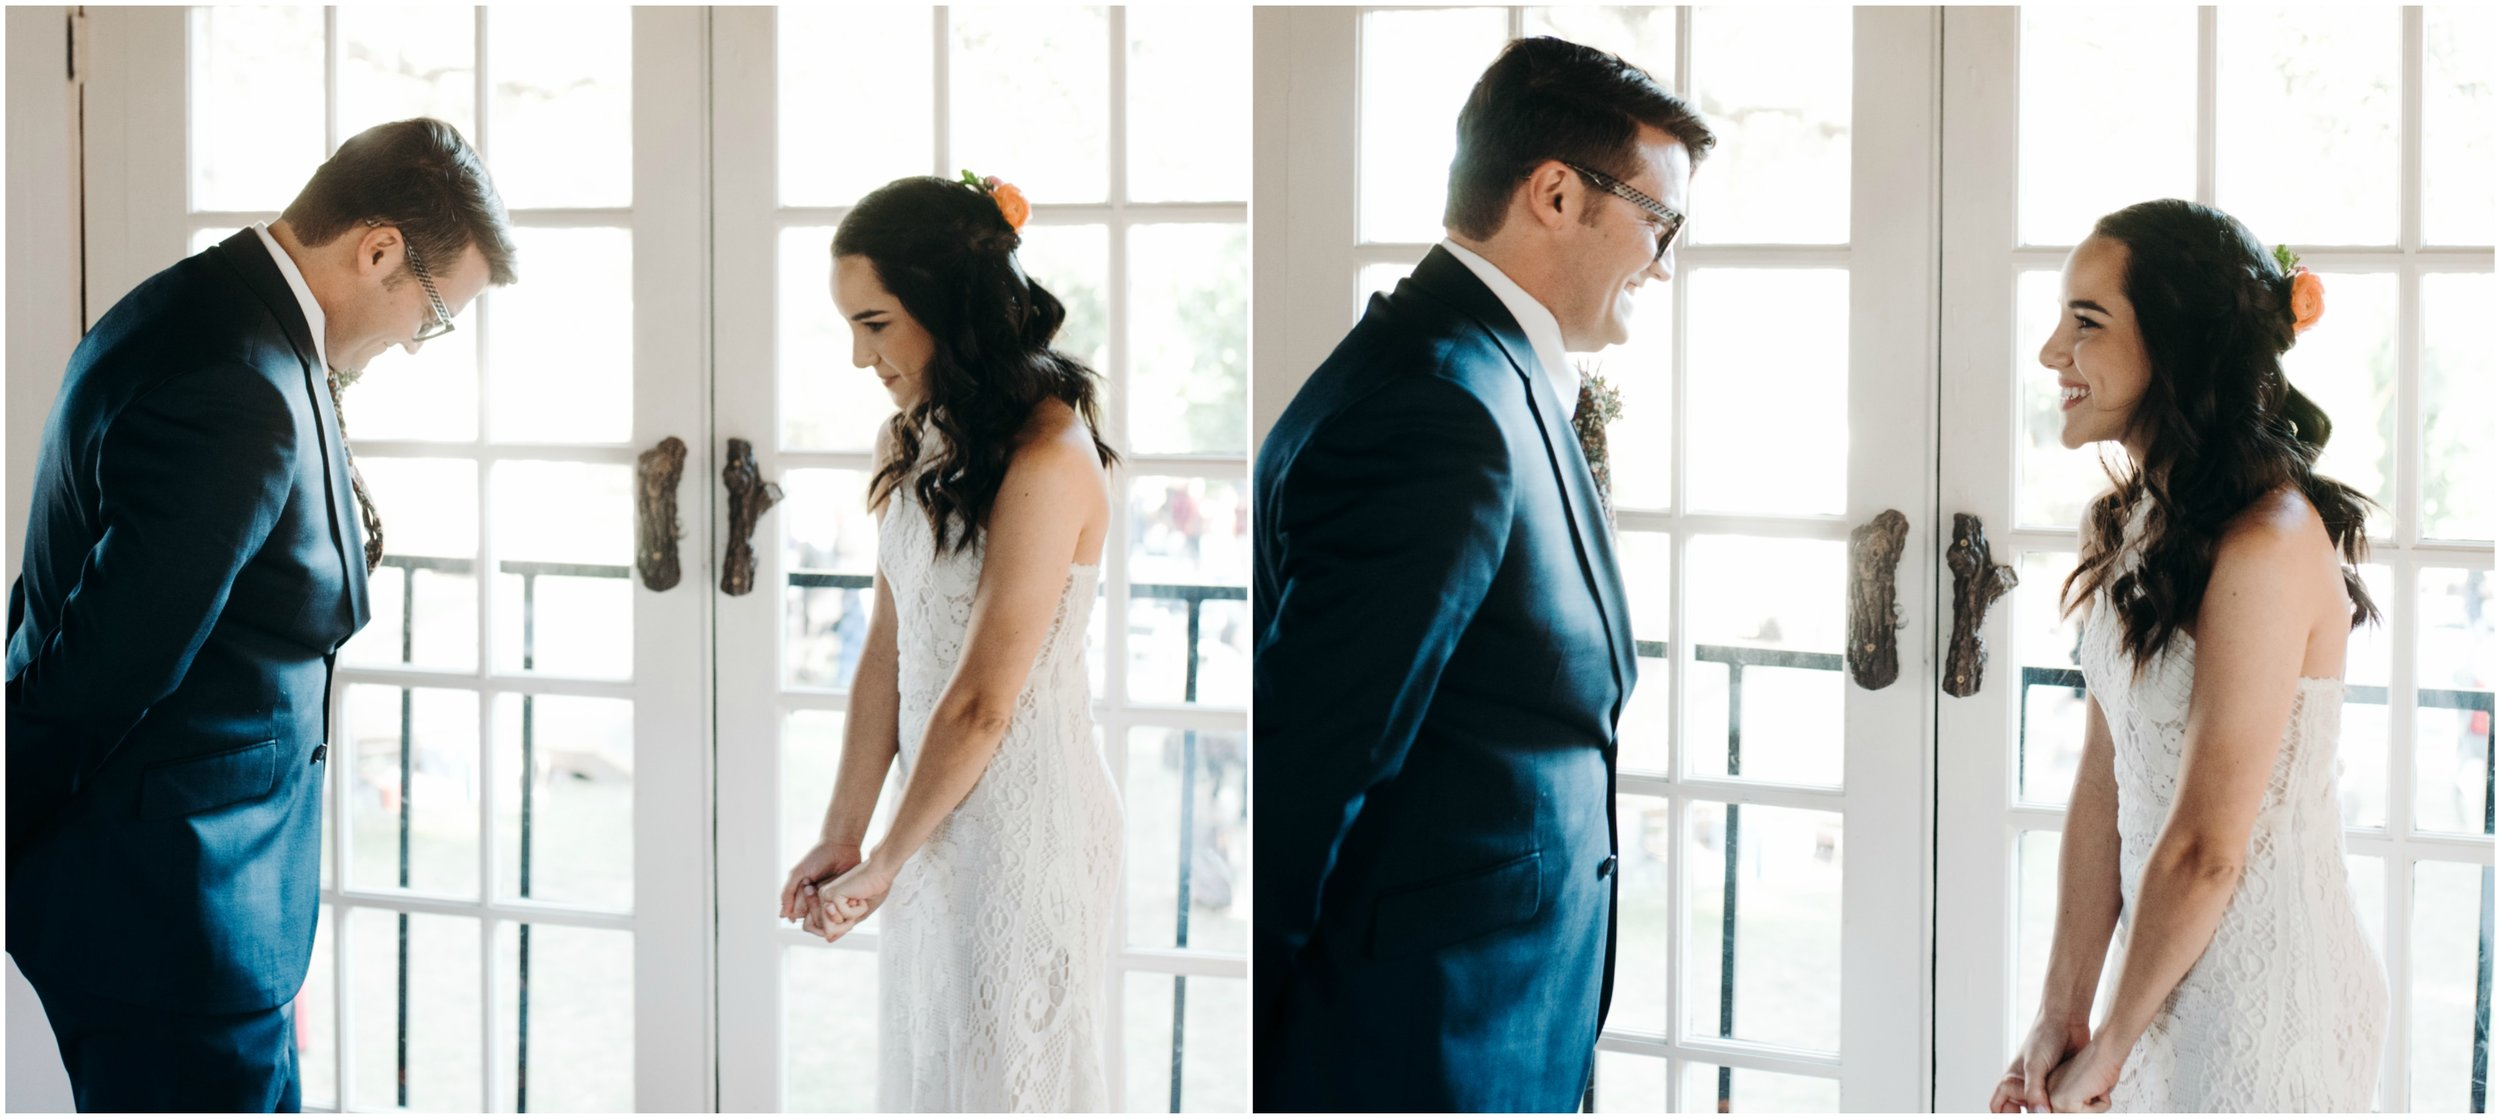 chelsea-julien-wedding-the-acre-first-look.jpg